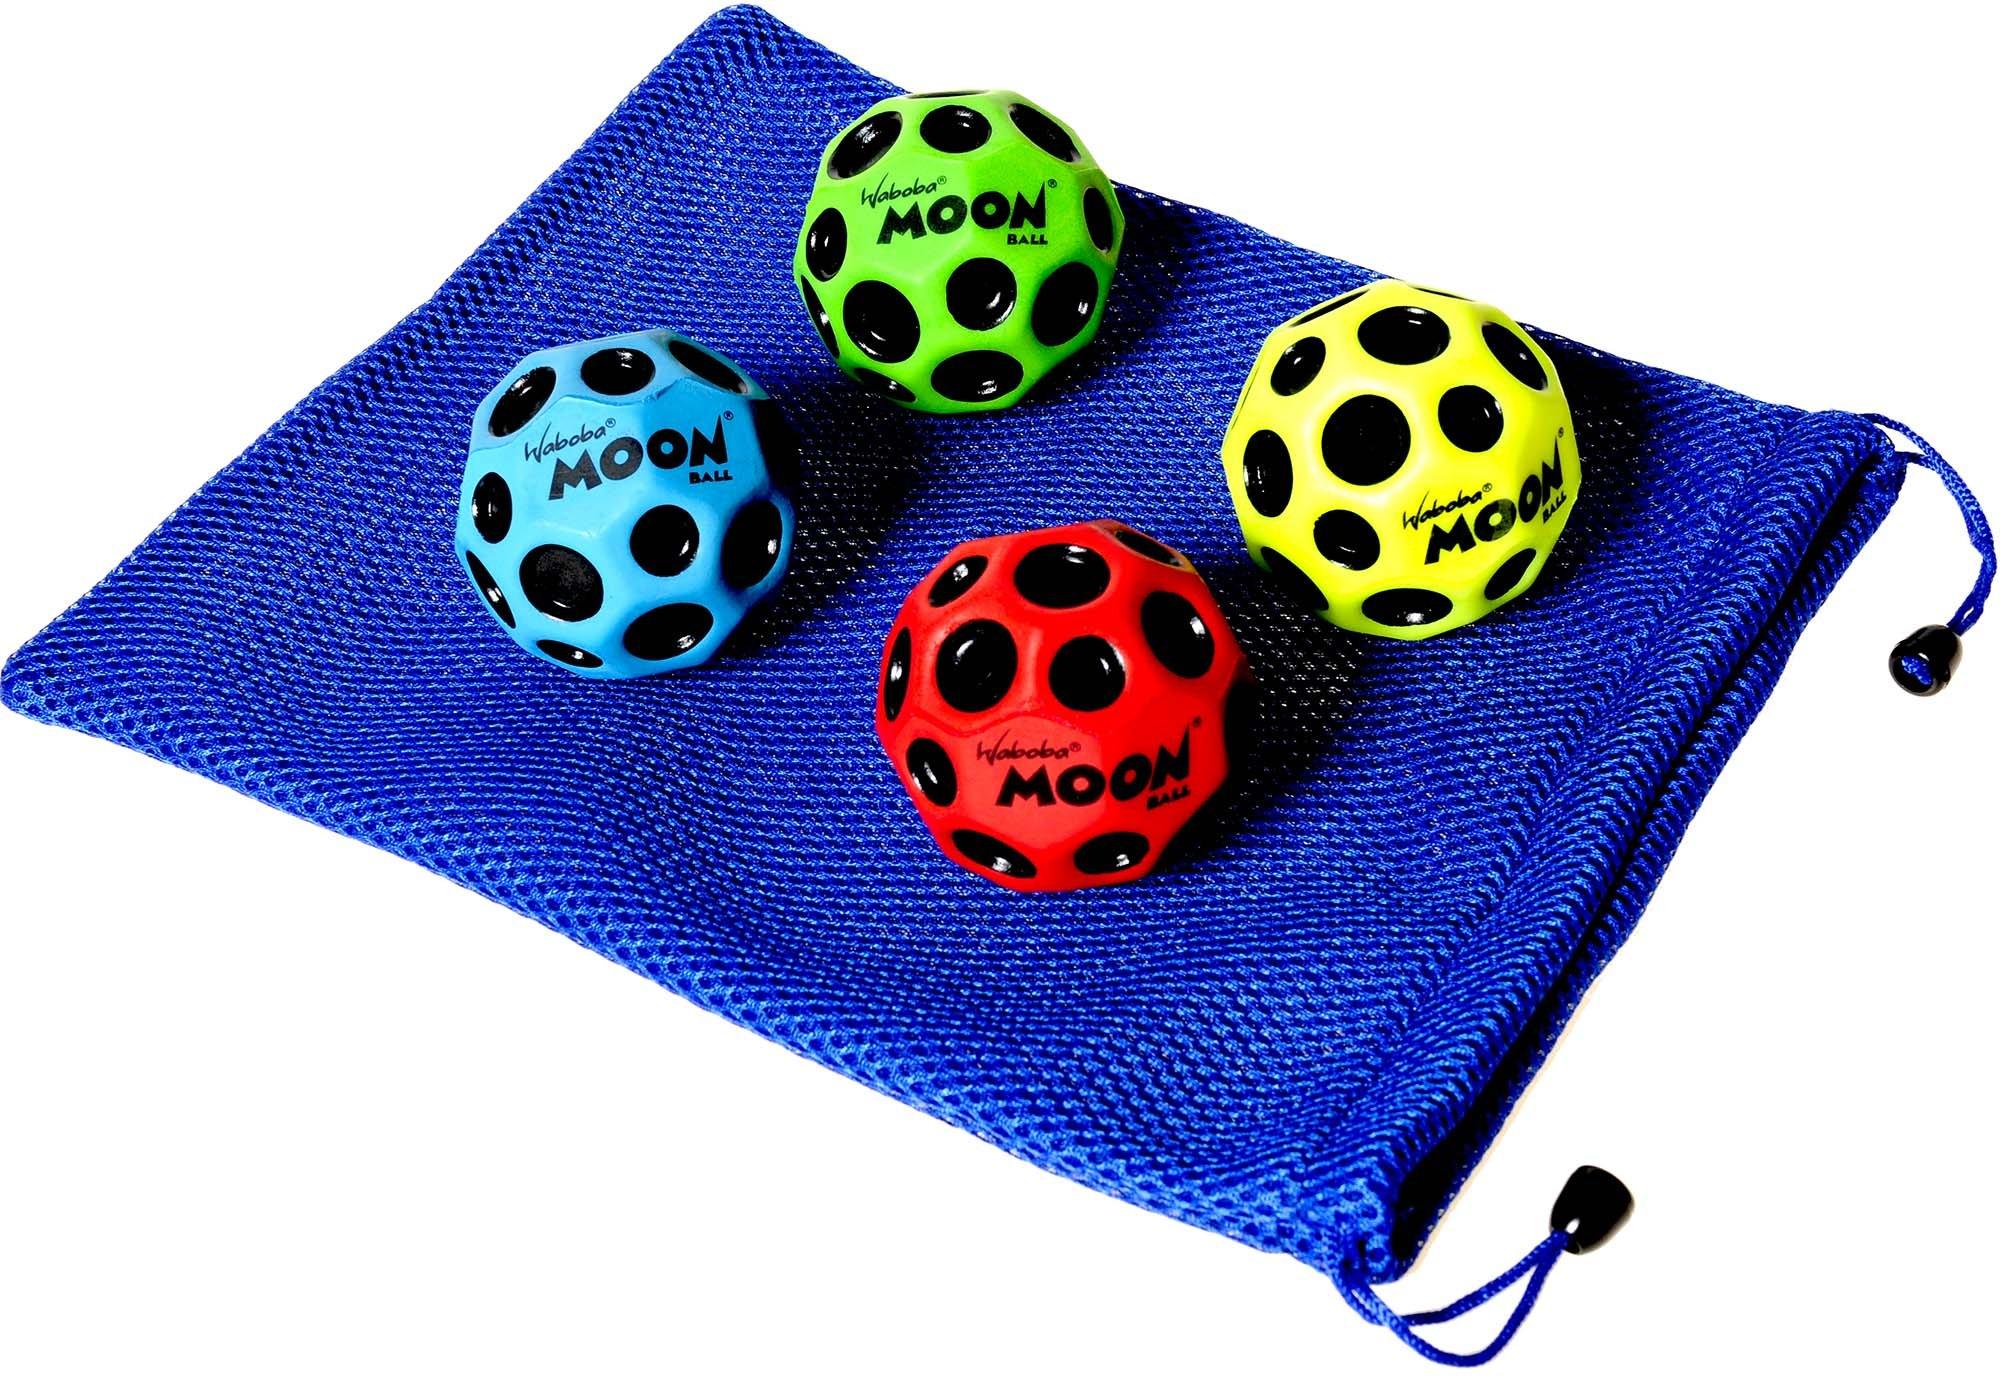 Waboba MOON Extreme Bounce Bundle of 4 Balls _ in 4 Neon Colors _ BONUS Soft Nylon Net Drawstring 9 x 12'' Royal Blue Carry Bag